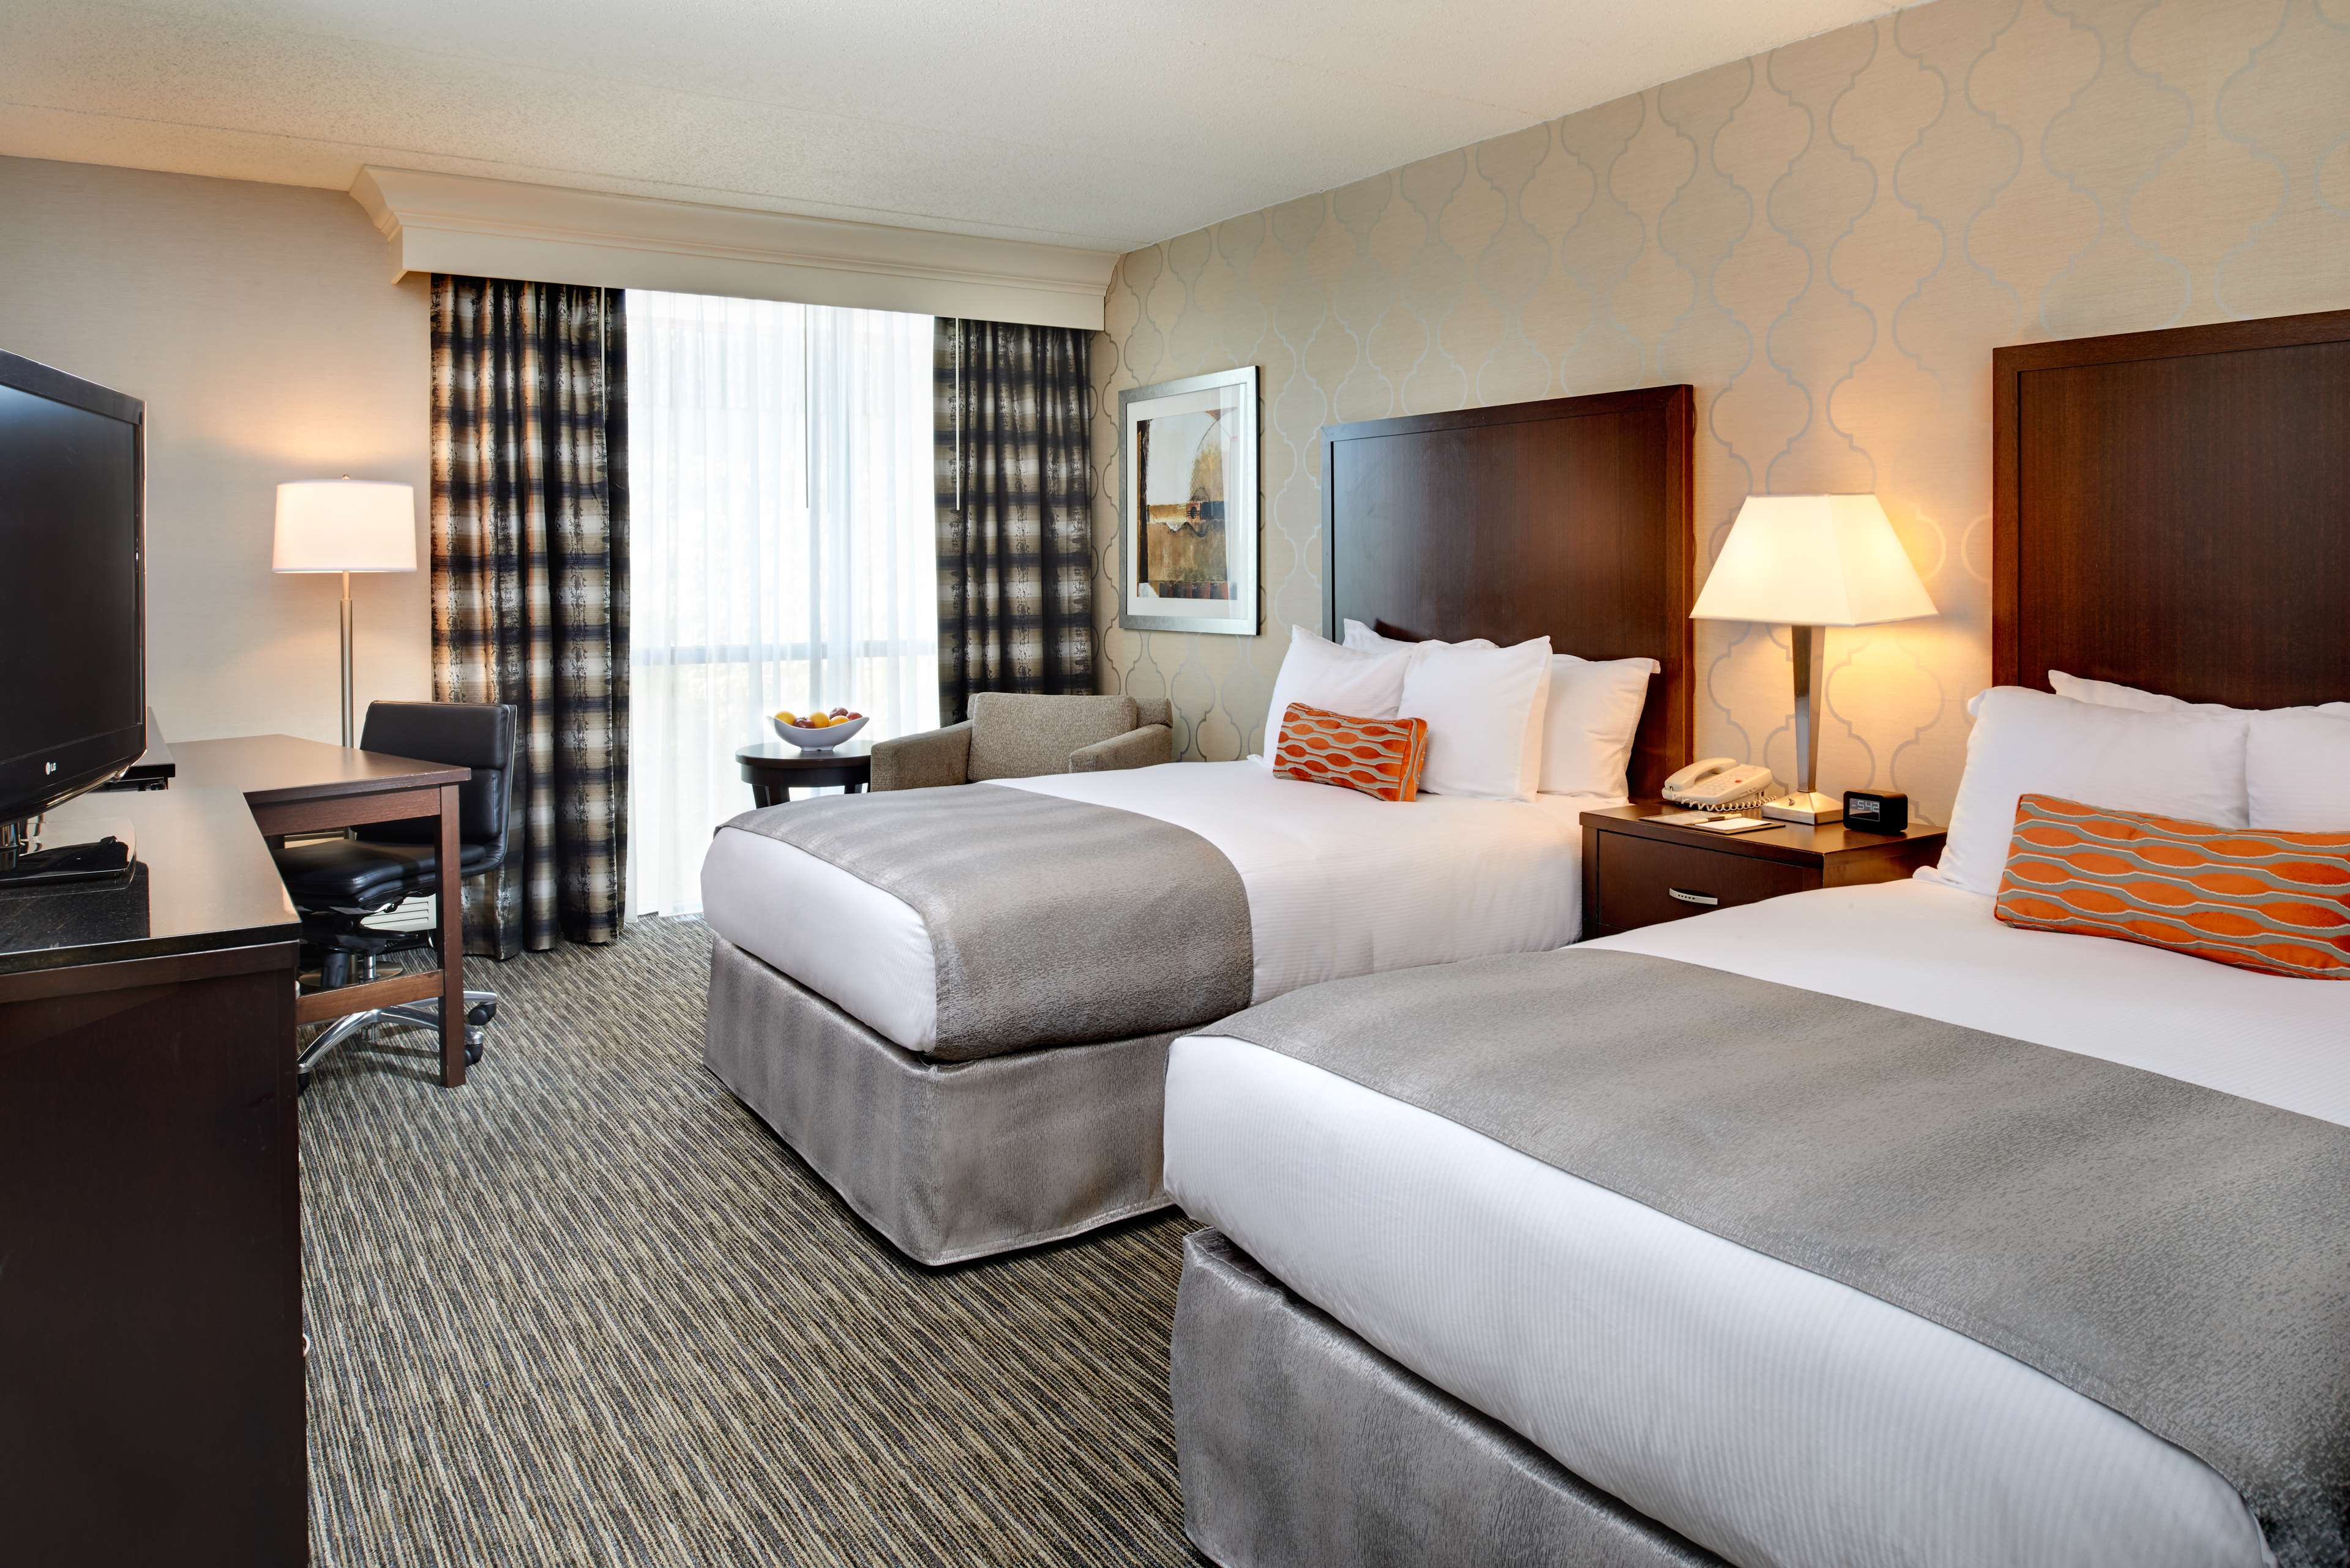 DoubleTree by Hilton Hotel Detroit - Dearborn image 16